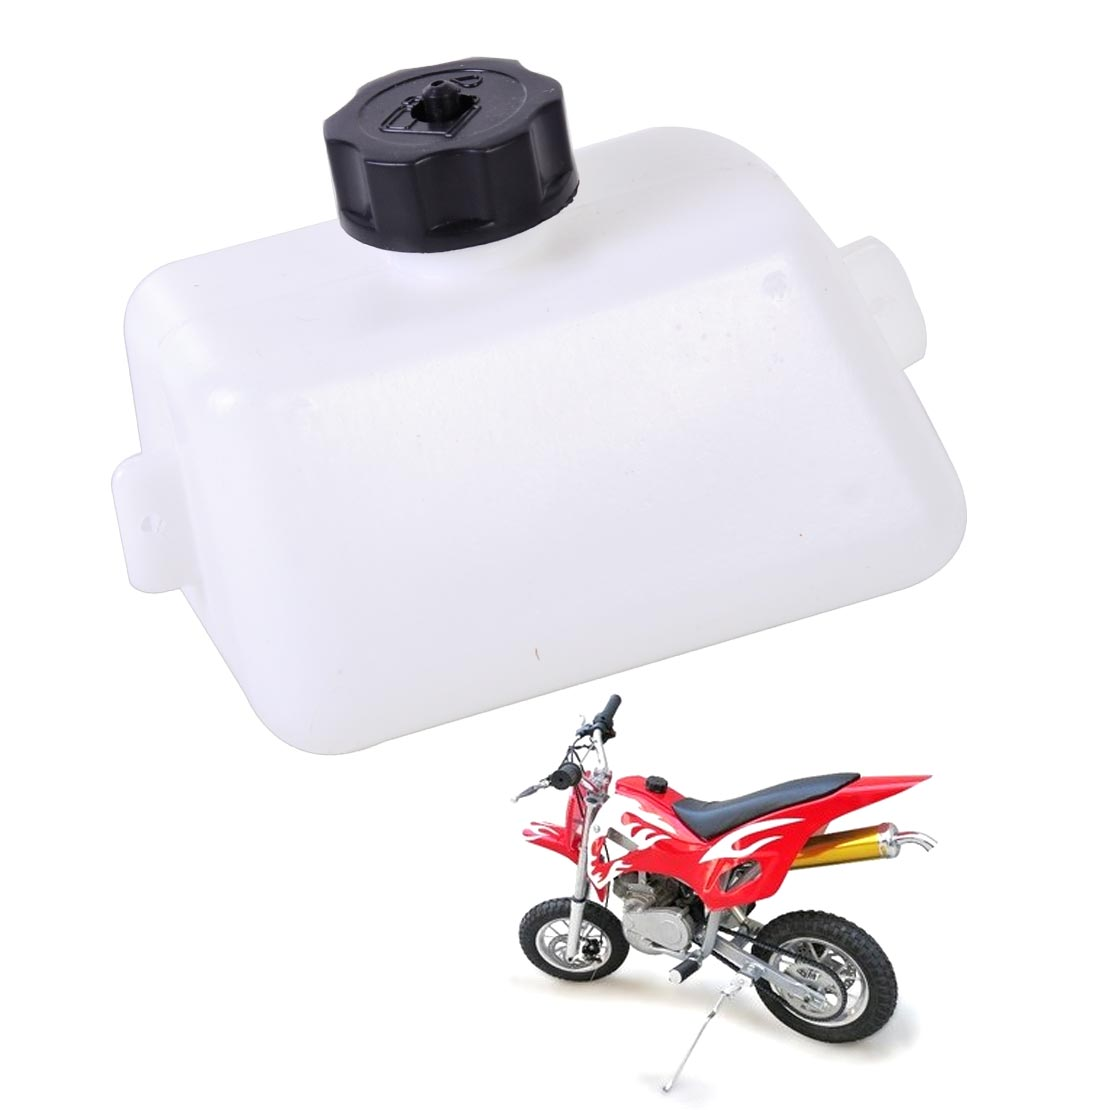 Dwcx new motorcycle white plastic gas fuel tank fit for 2 stroke 43cc 47cc 49cc mini